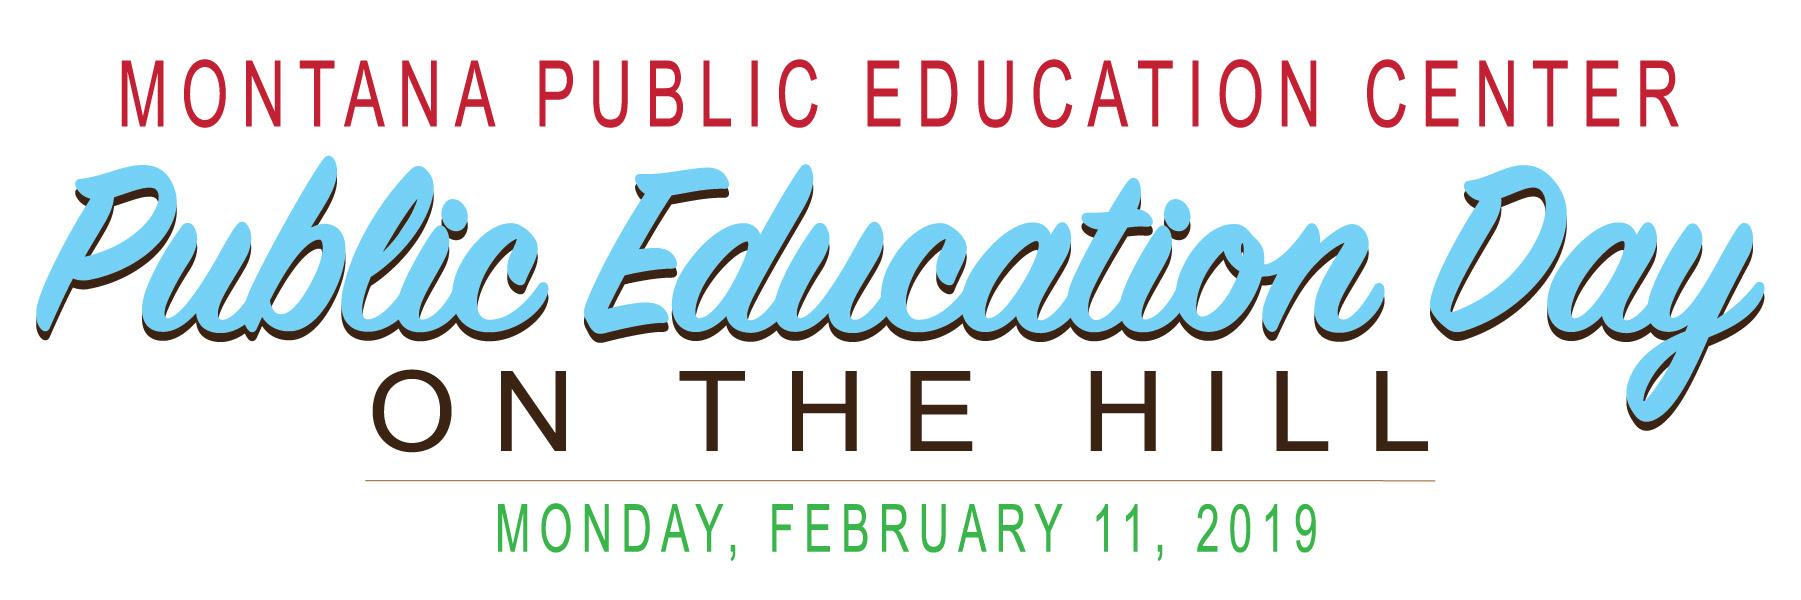 Public_Education-Day-onthe-Hill-2019.jpg - 216.81 Kb